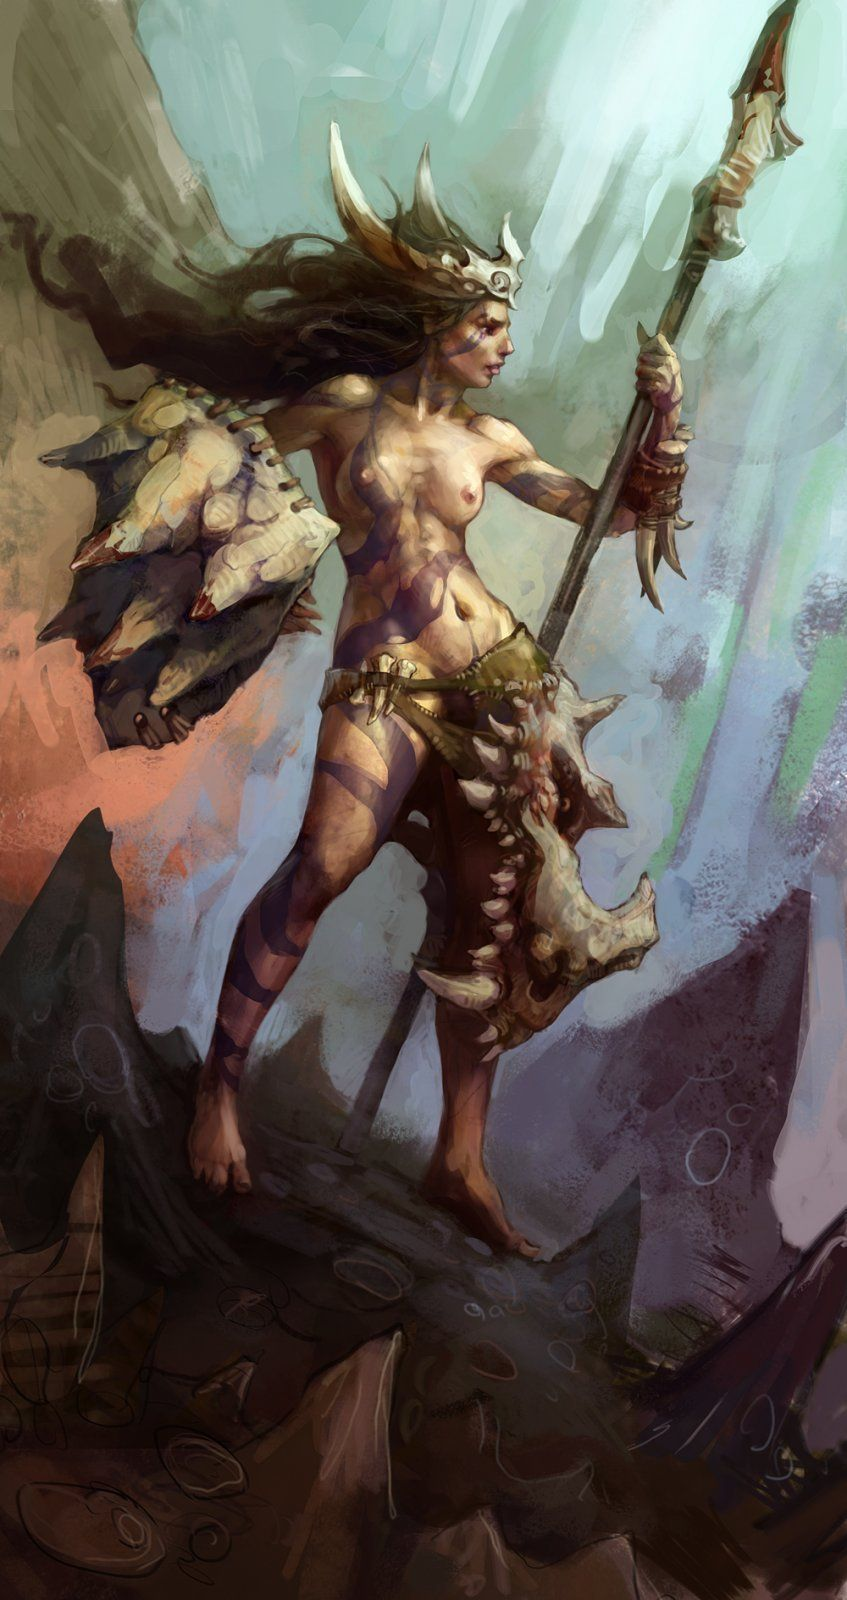 Barbarian sexy